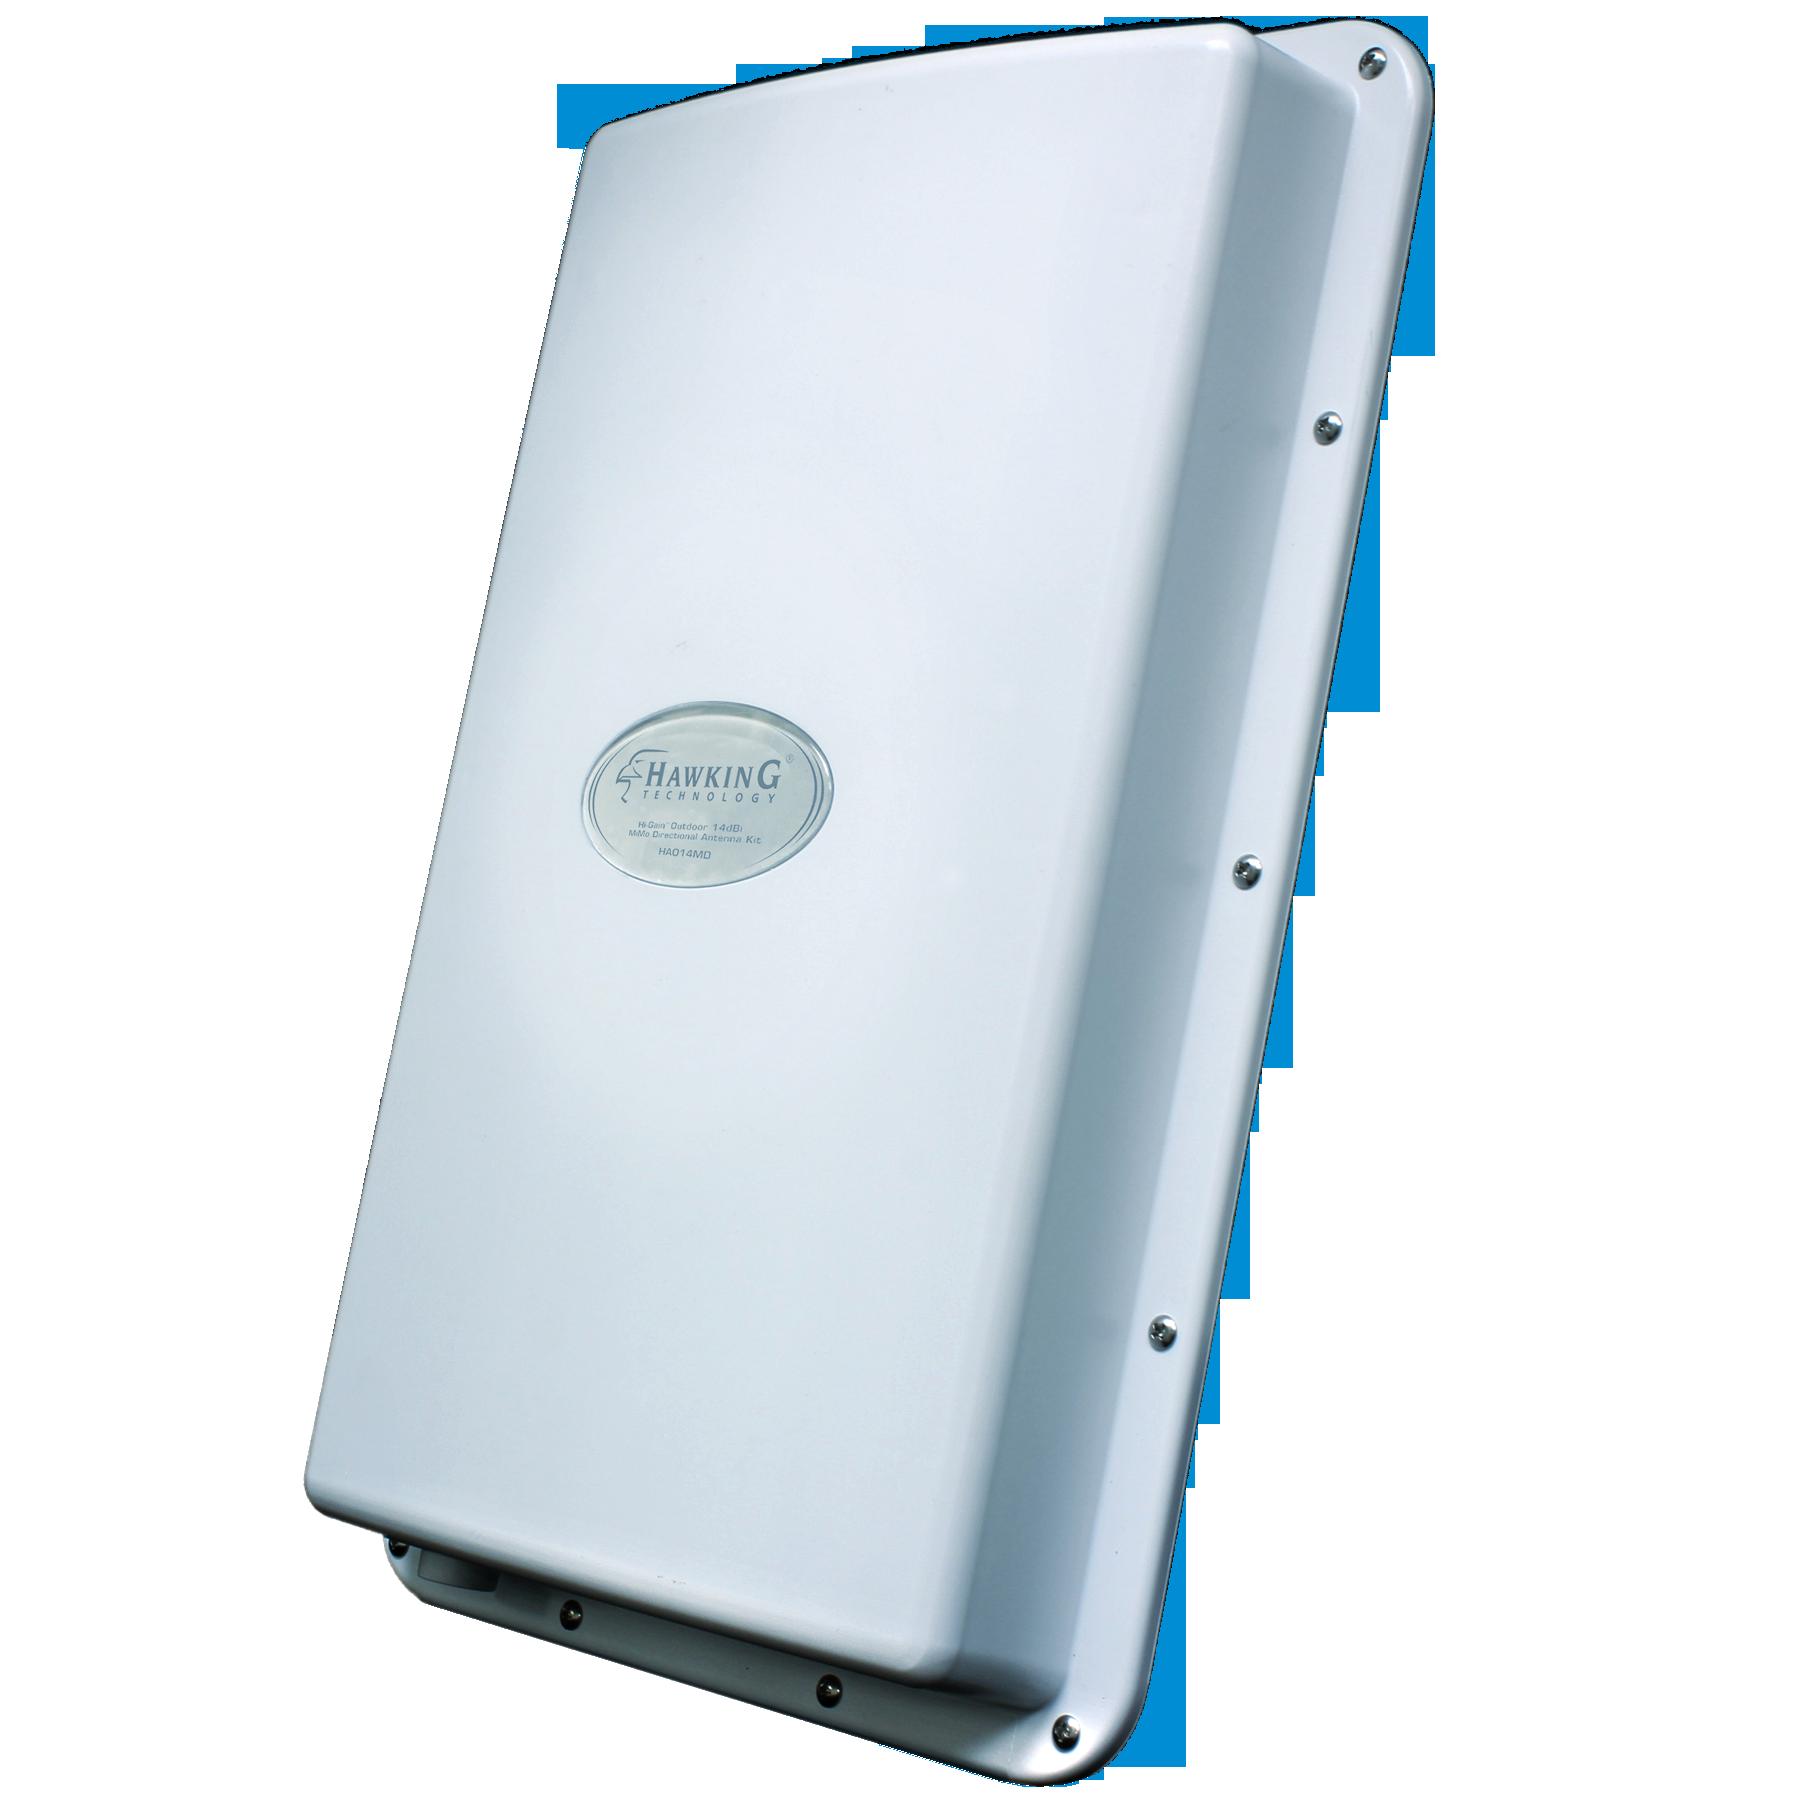 HAO14MD Hawking Technology Hi-Gain Outdoor MiMo Directional 14dBi Antenna Kit